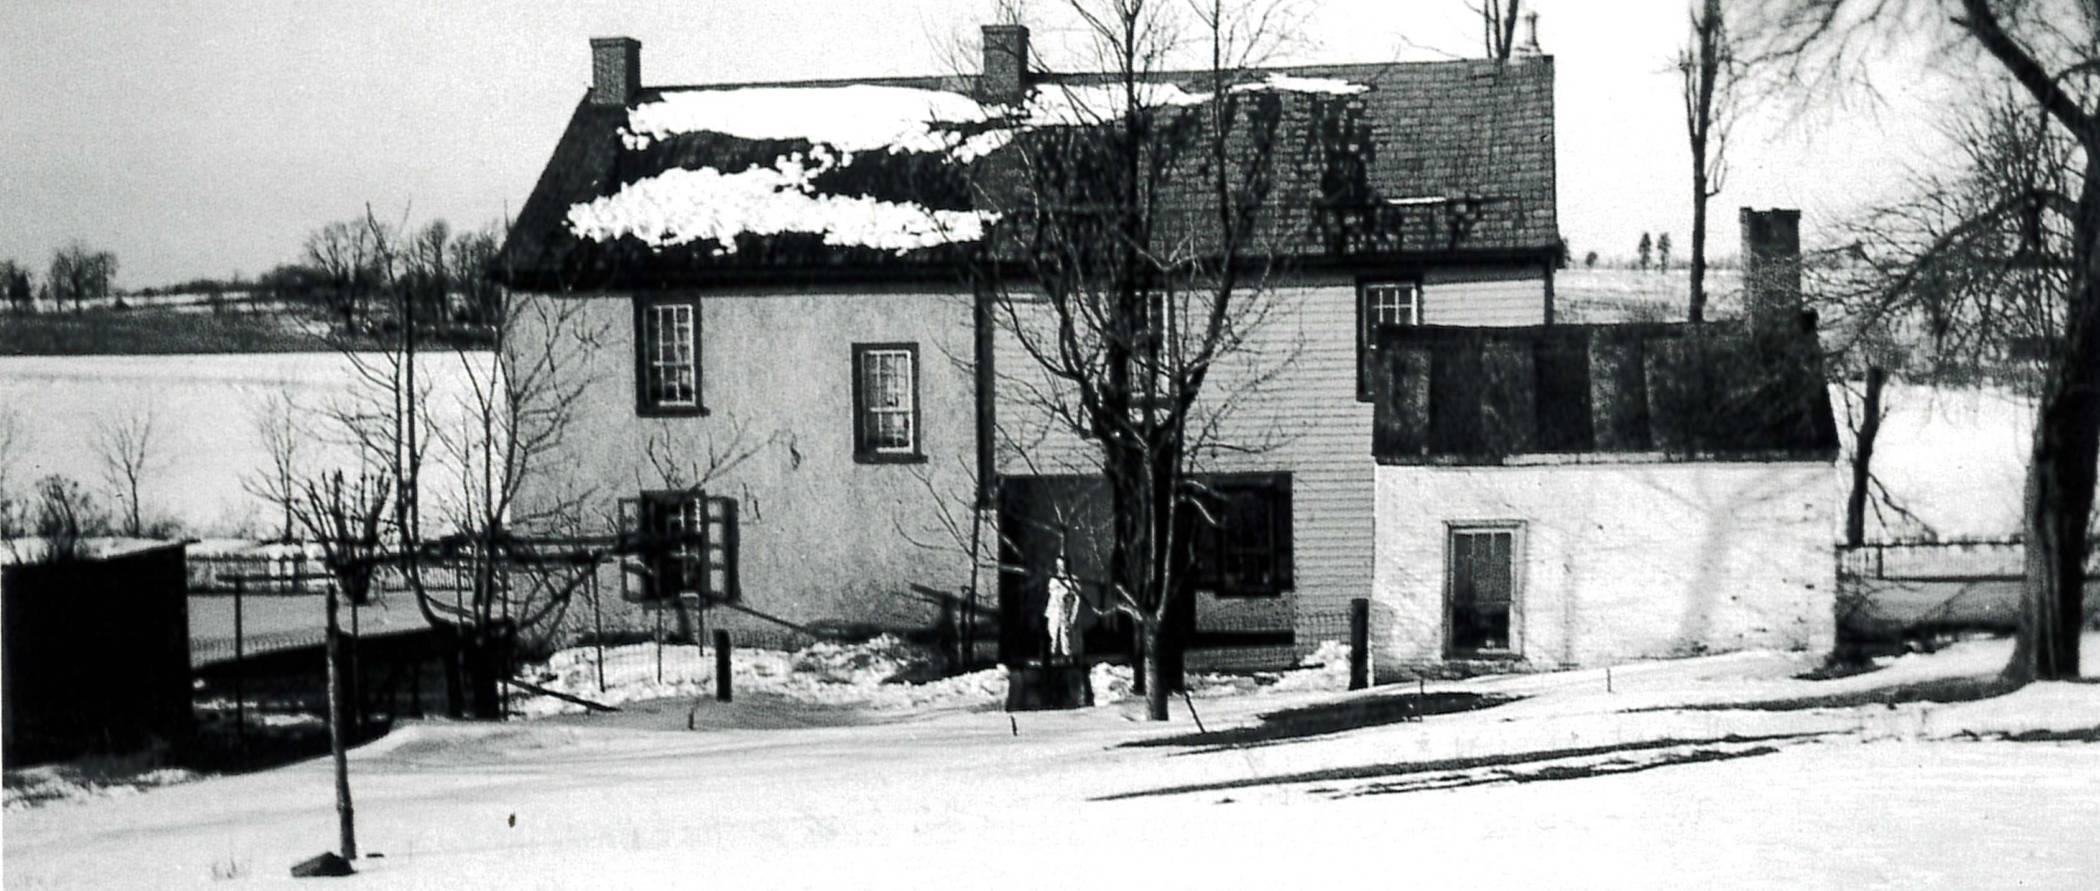 emmaus farm 1940